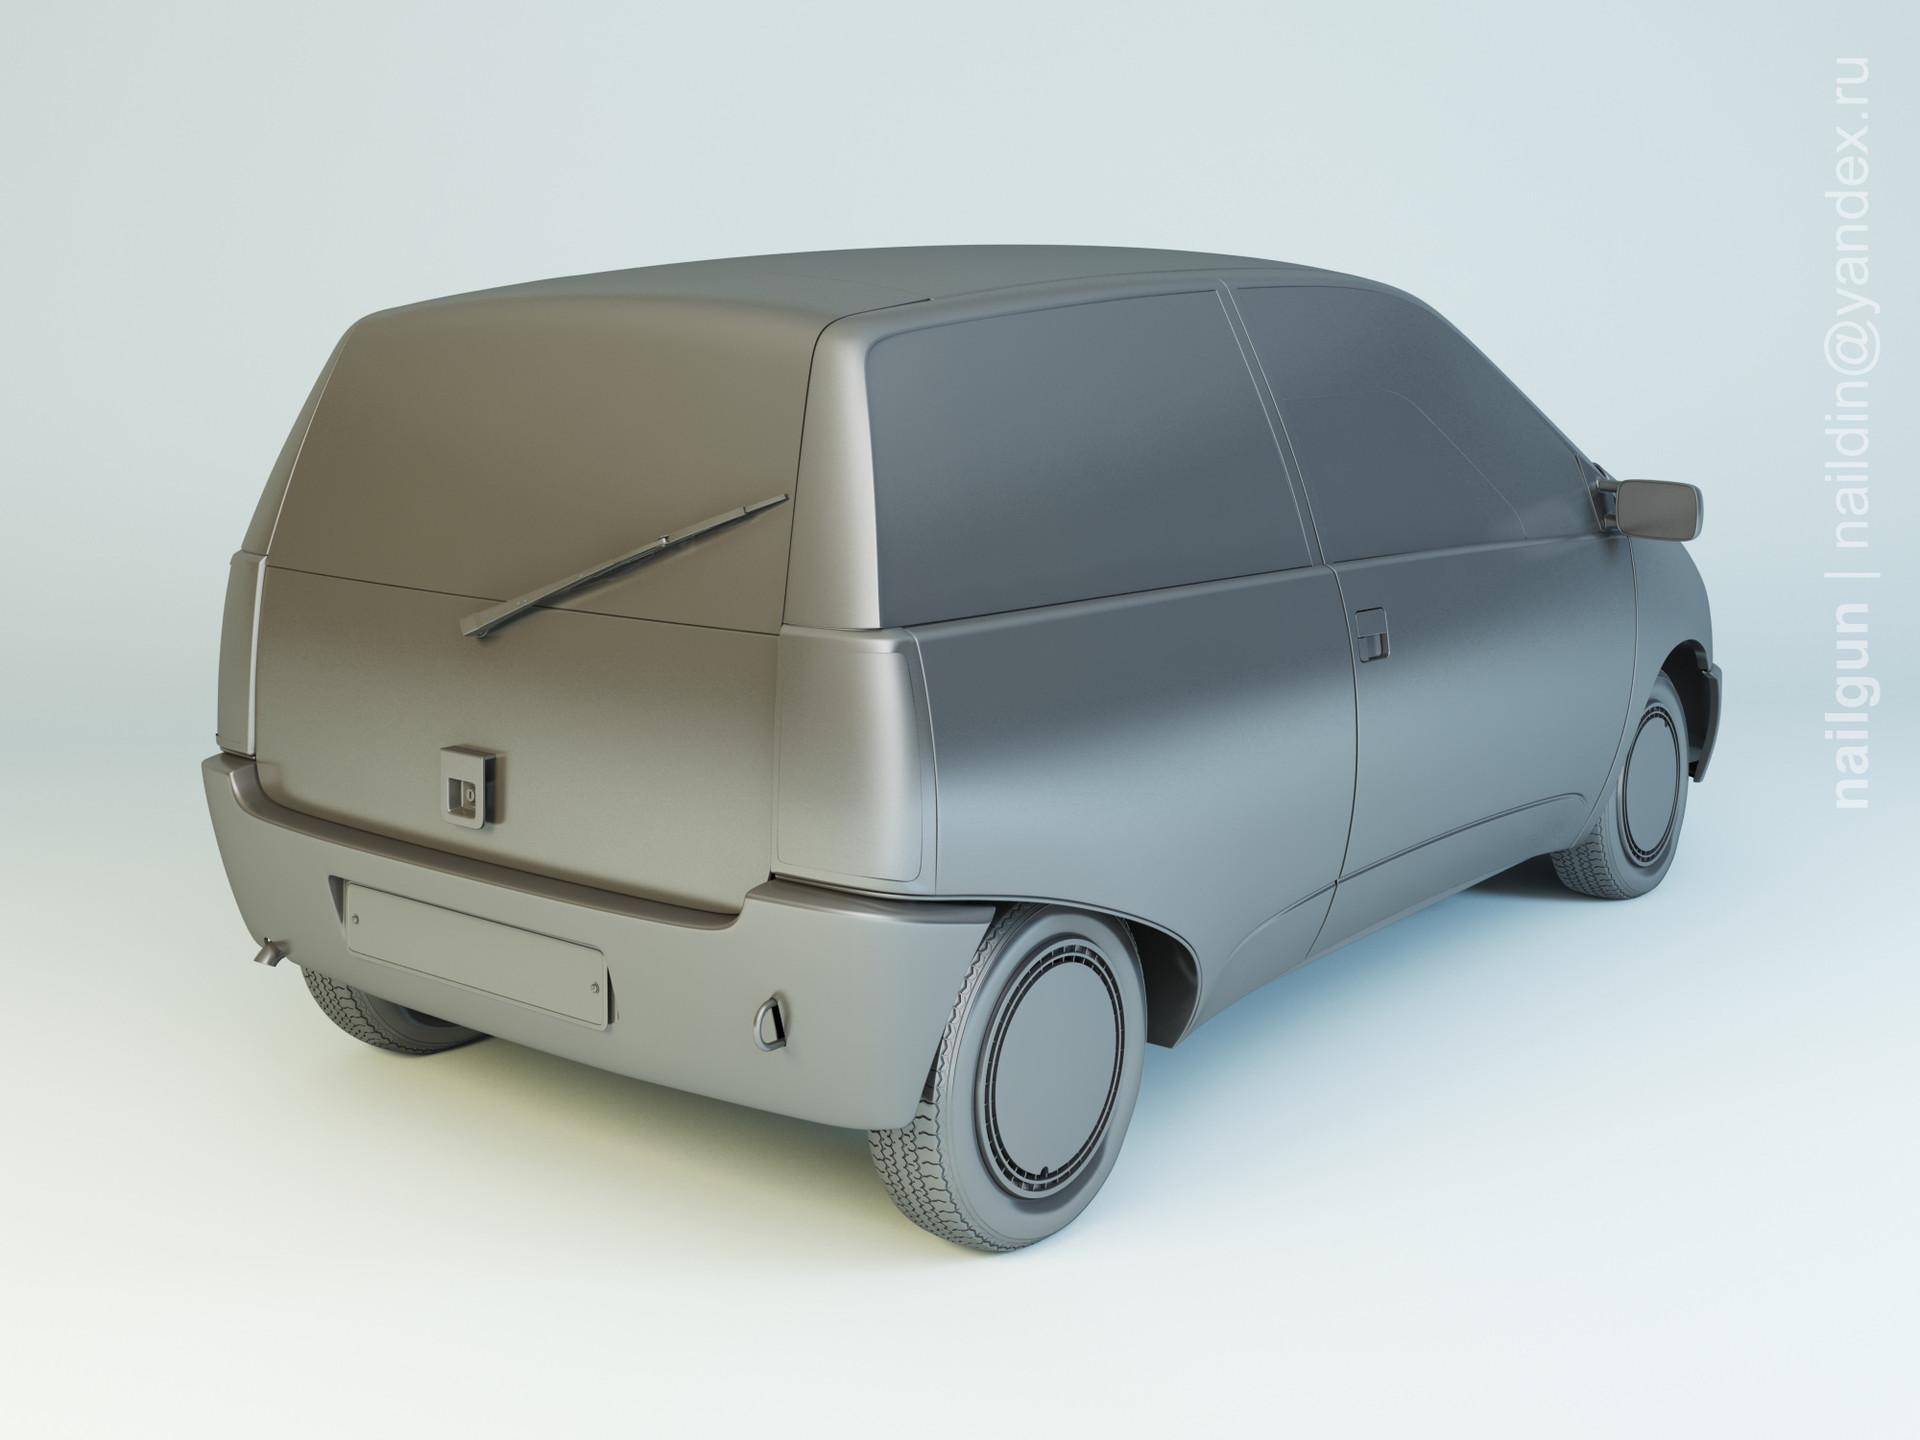 Nail khusnutdinov al 142 003 nami 0288 compact modellling 1